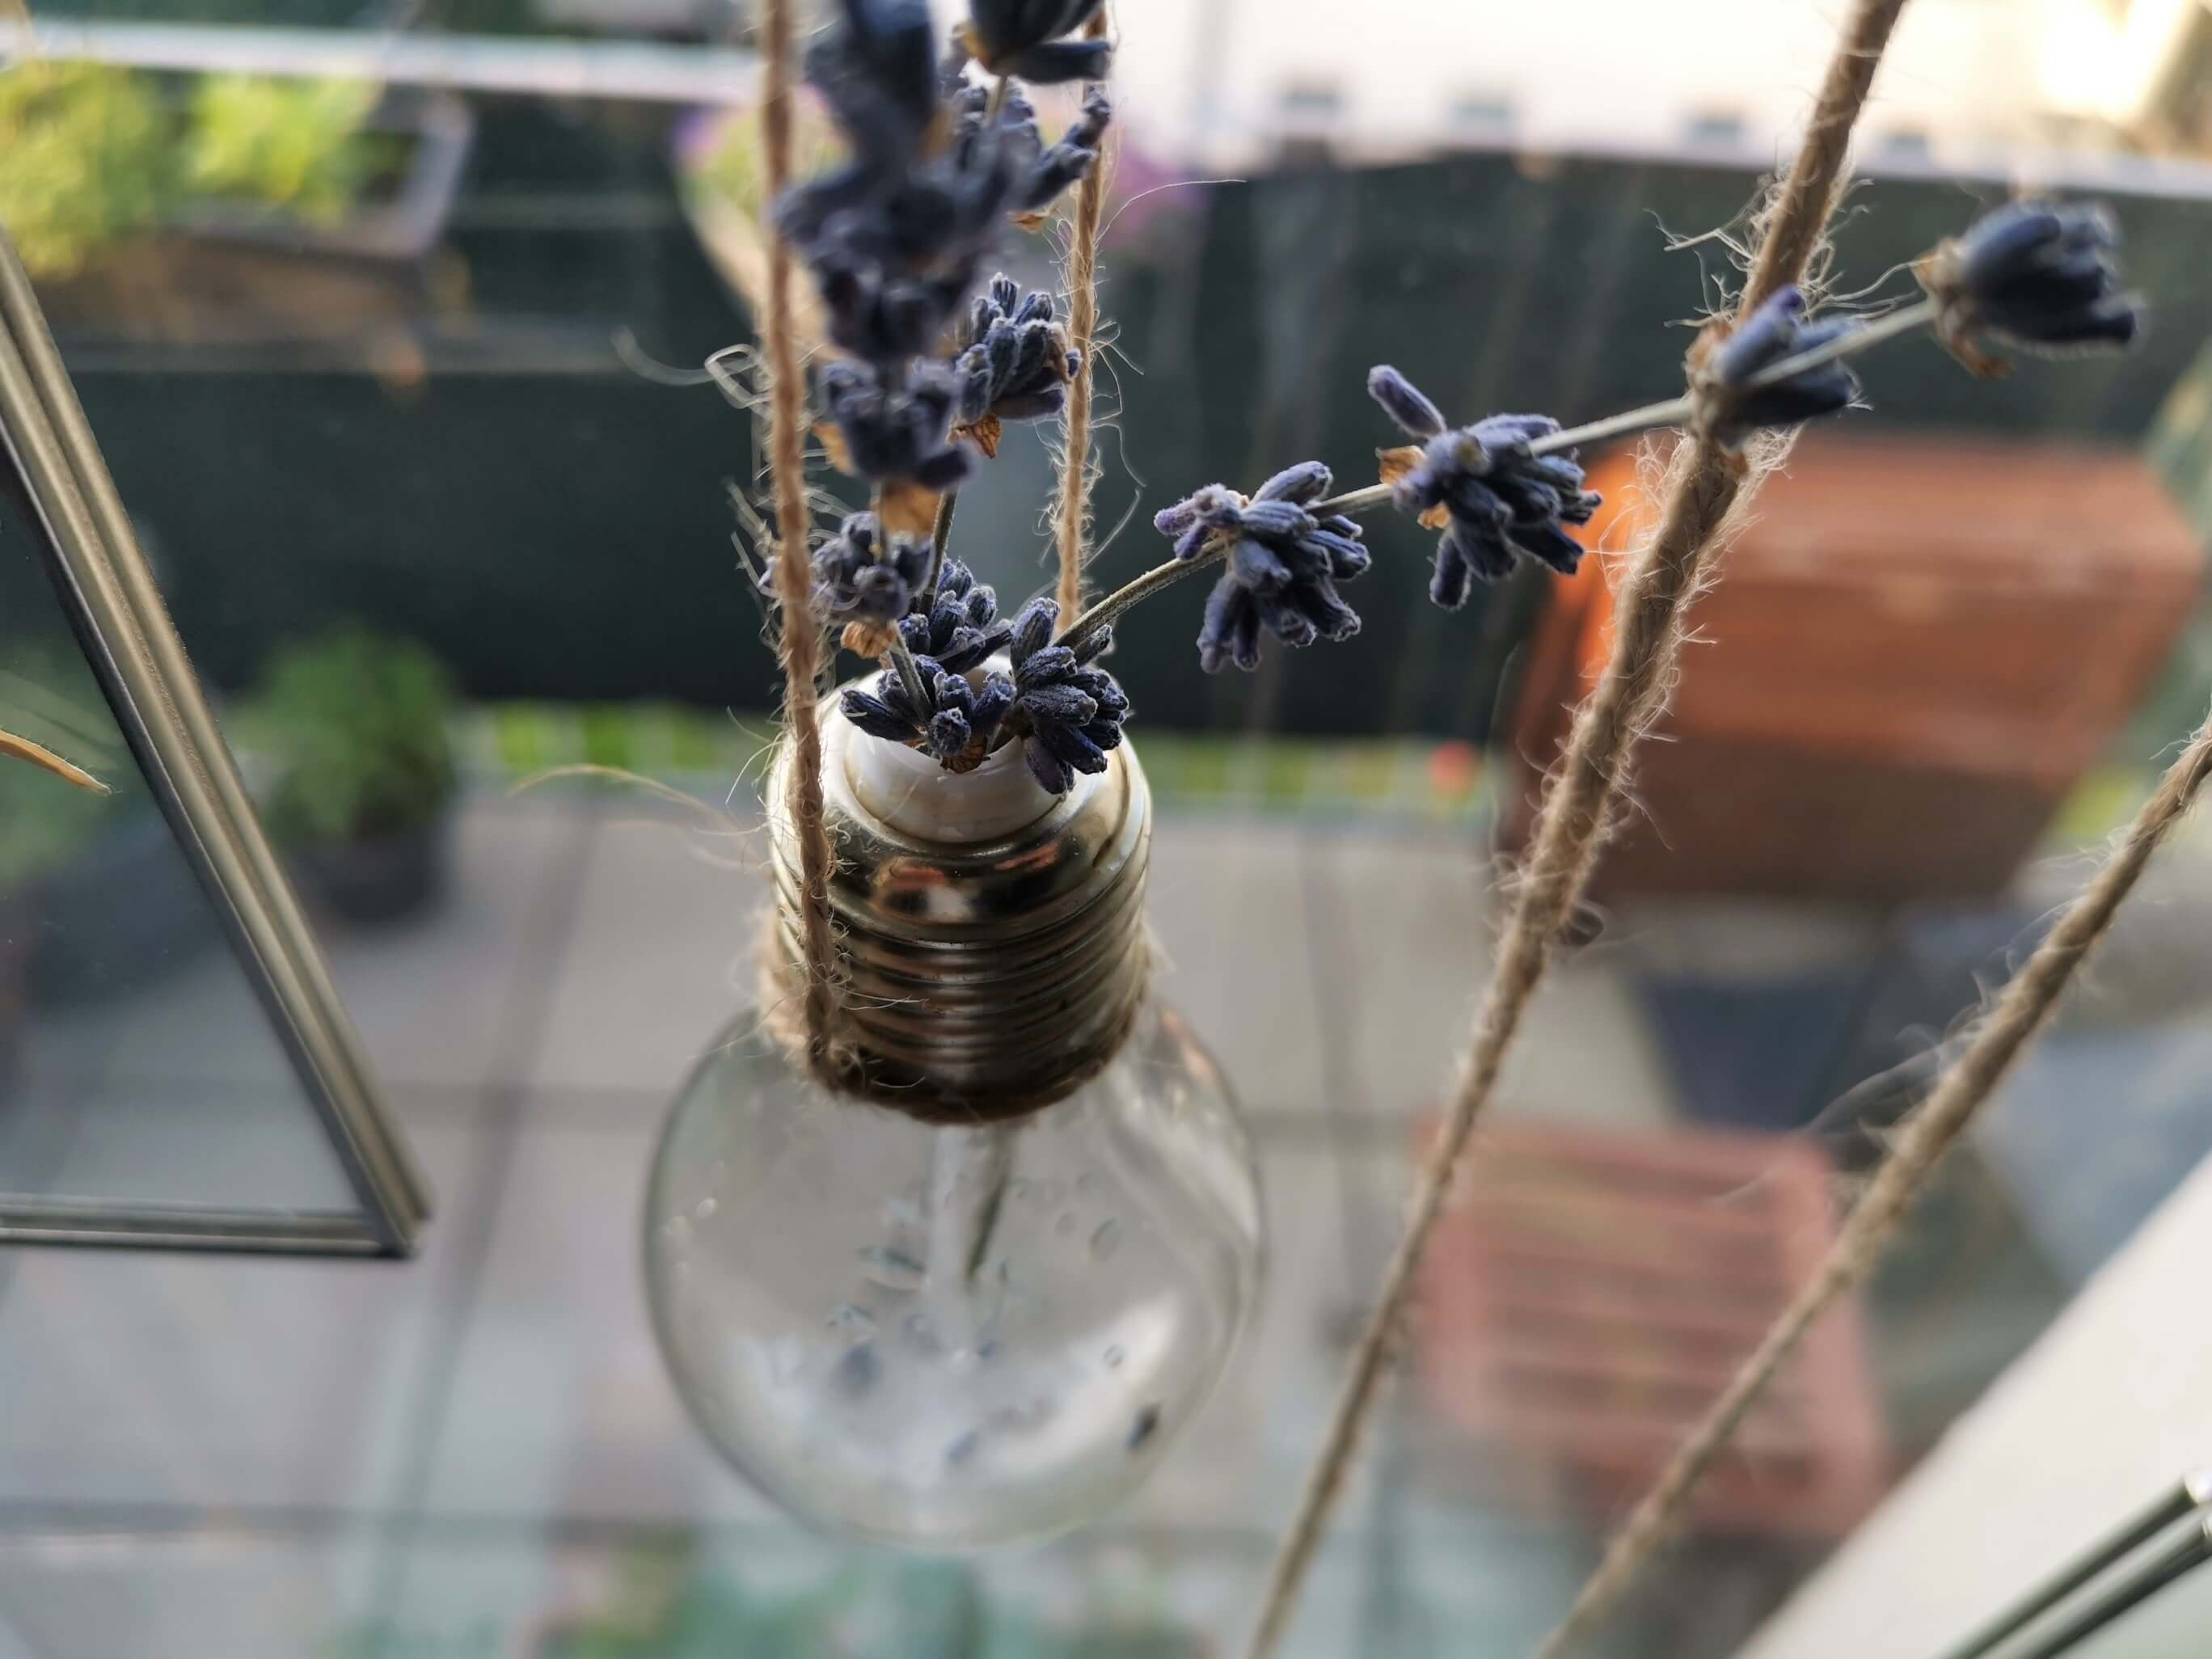 IMG 20190501 185622 resized 20190501 070443406 - Botanische Fensterdekoration: Herbarium statt Gardinen